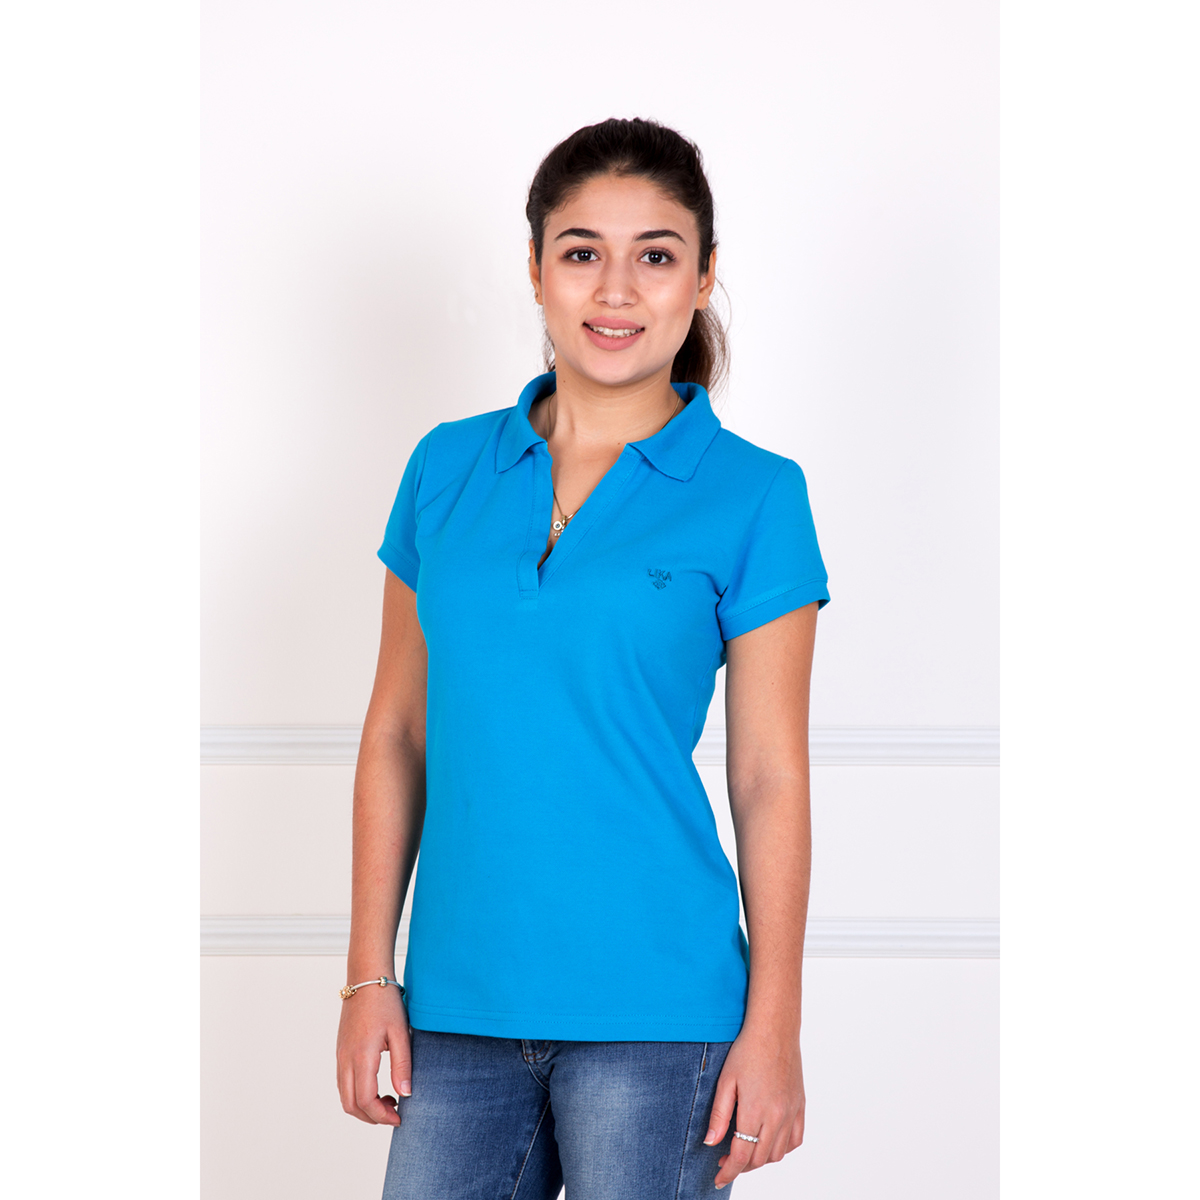 Женская футболка-поло Шерт Голубой, размер 42Блузки, майки, кофты<br>Обхват груди:84 см<br>Обхват талии:65 см<br>Обхват бедер:92 см<br>Рост:167 см<br><br>Тип: Жен. футболка<br>Размер: 42<br>Материал: Пике